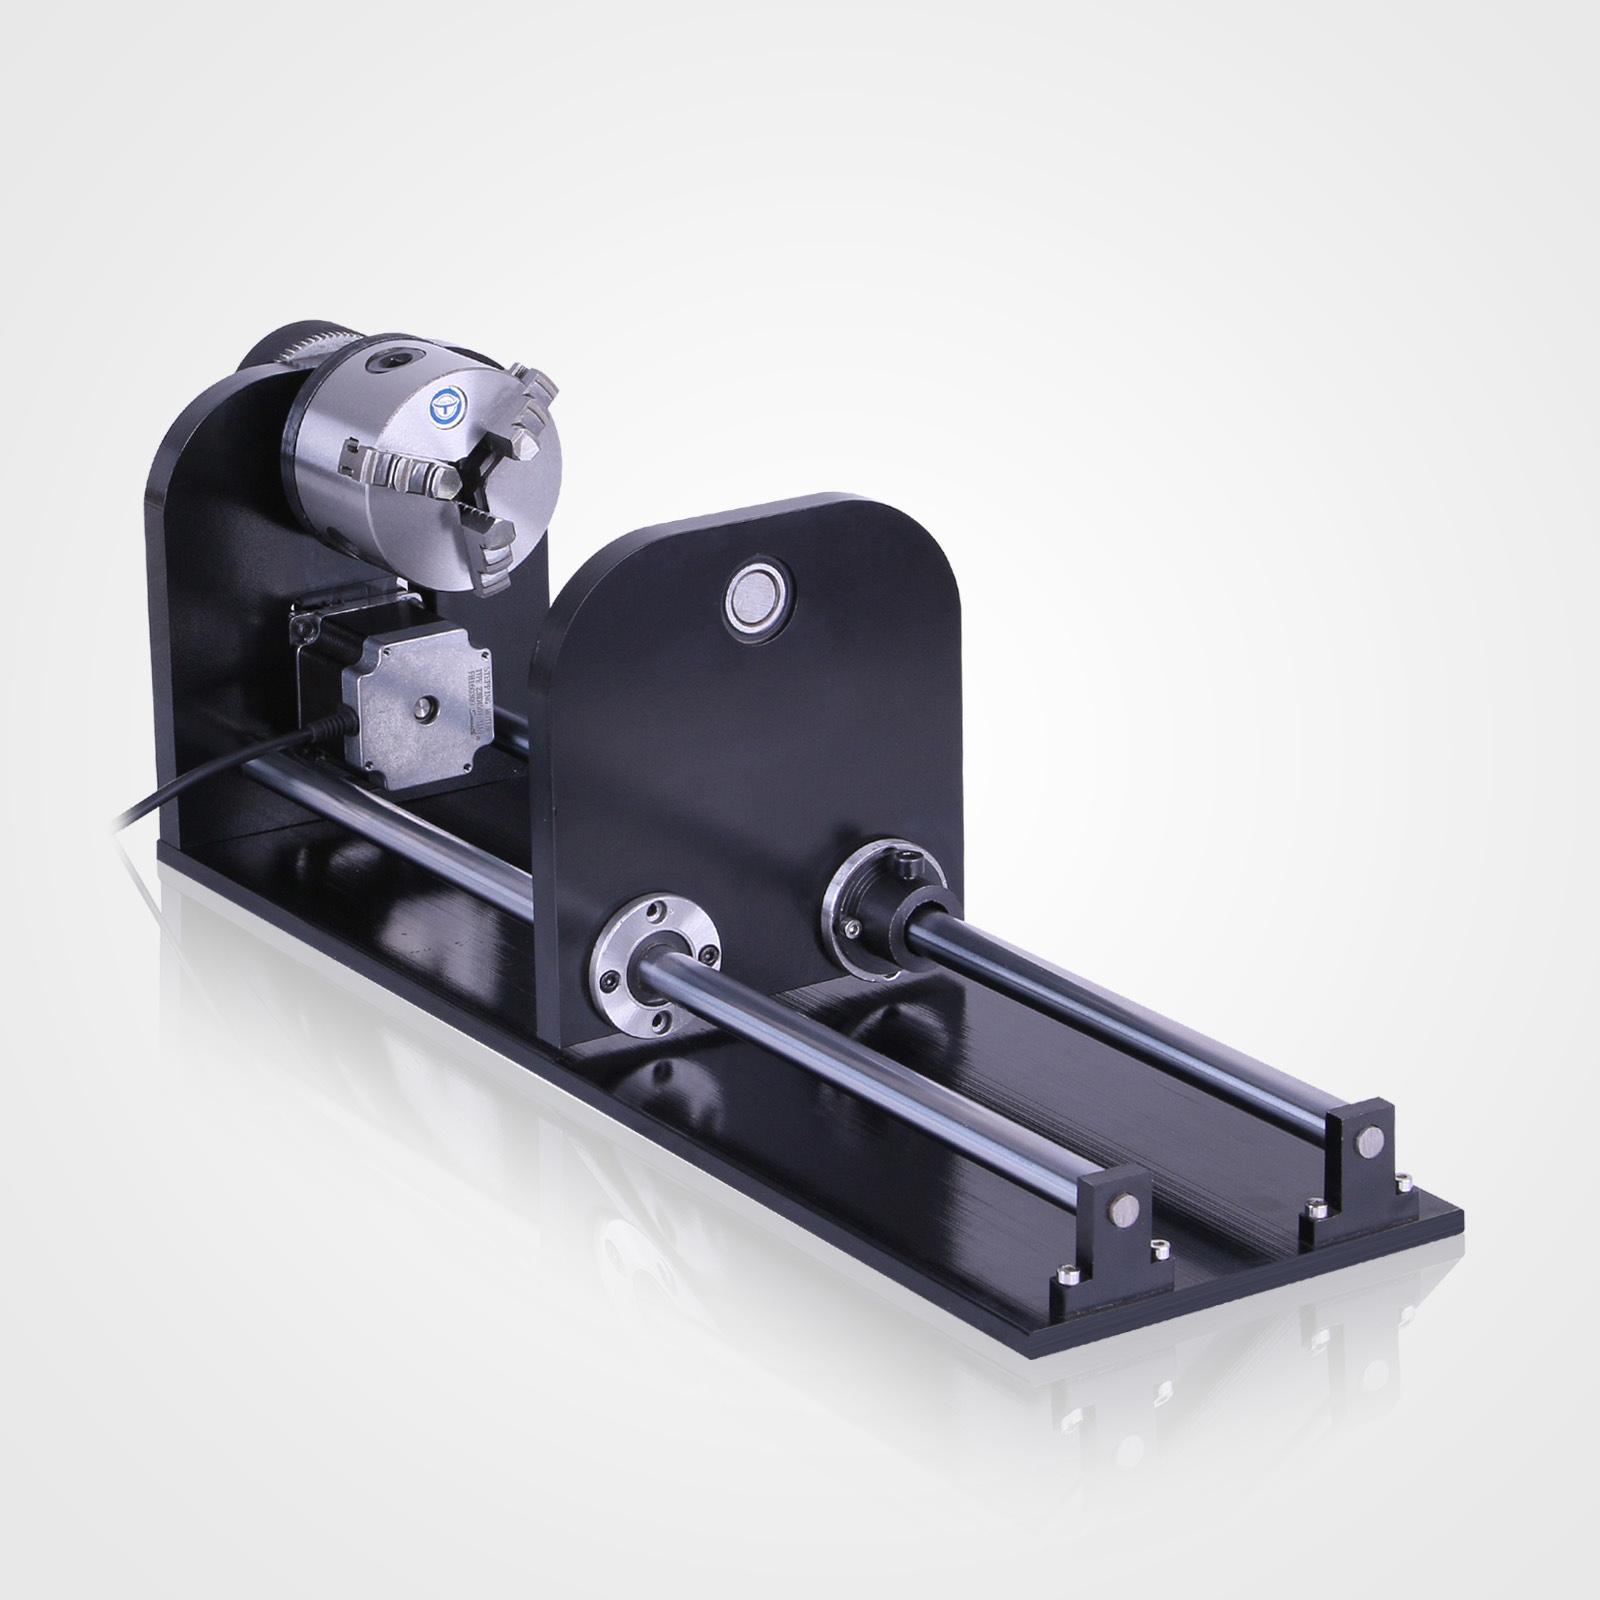 Macchina-per-Incisione-Laser-CO2-40-130W-Asse-Rotante-Tagliatrice-Incisore miniatura 88